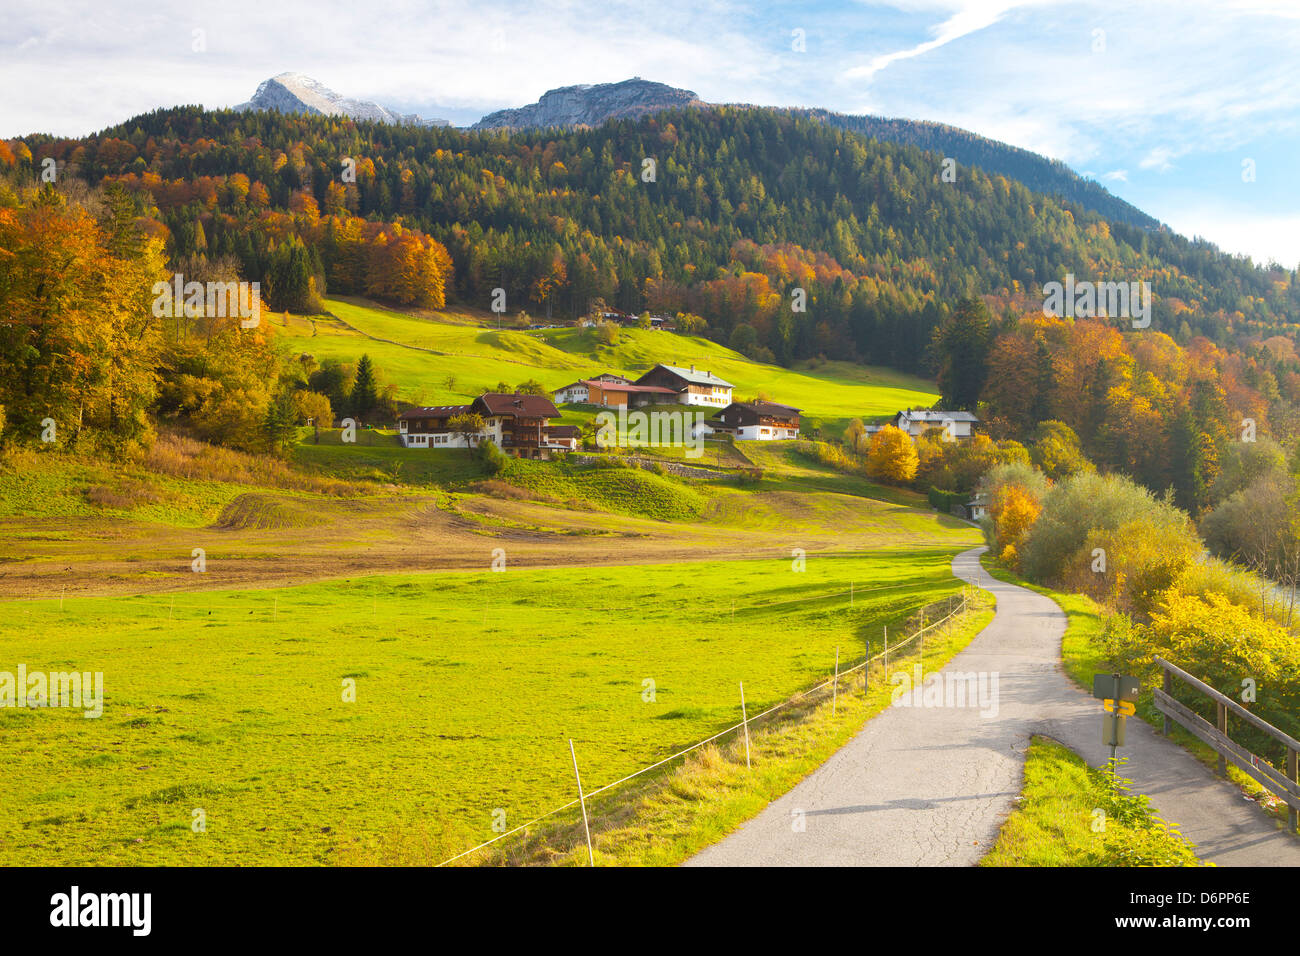 Ruta en Bicicleta a través del paisaje rural de montaña en otoño, cerca de Berchtesgaden, Baviera, Imagen De Stock